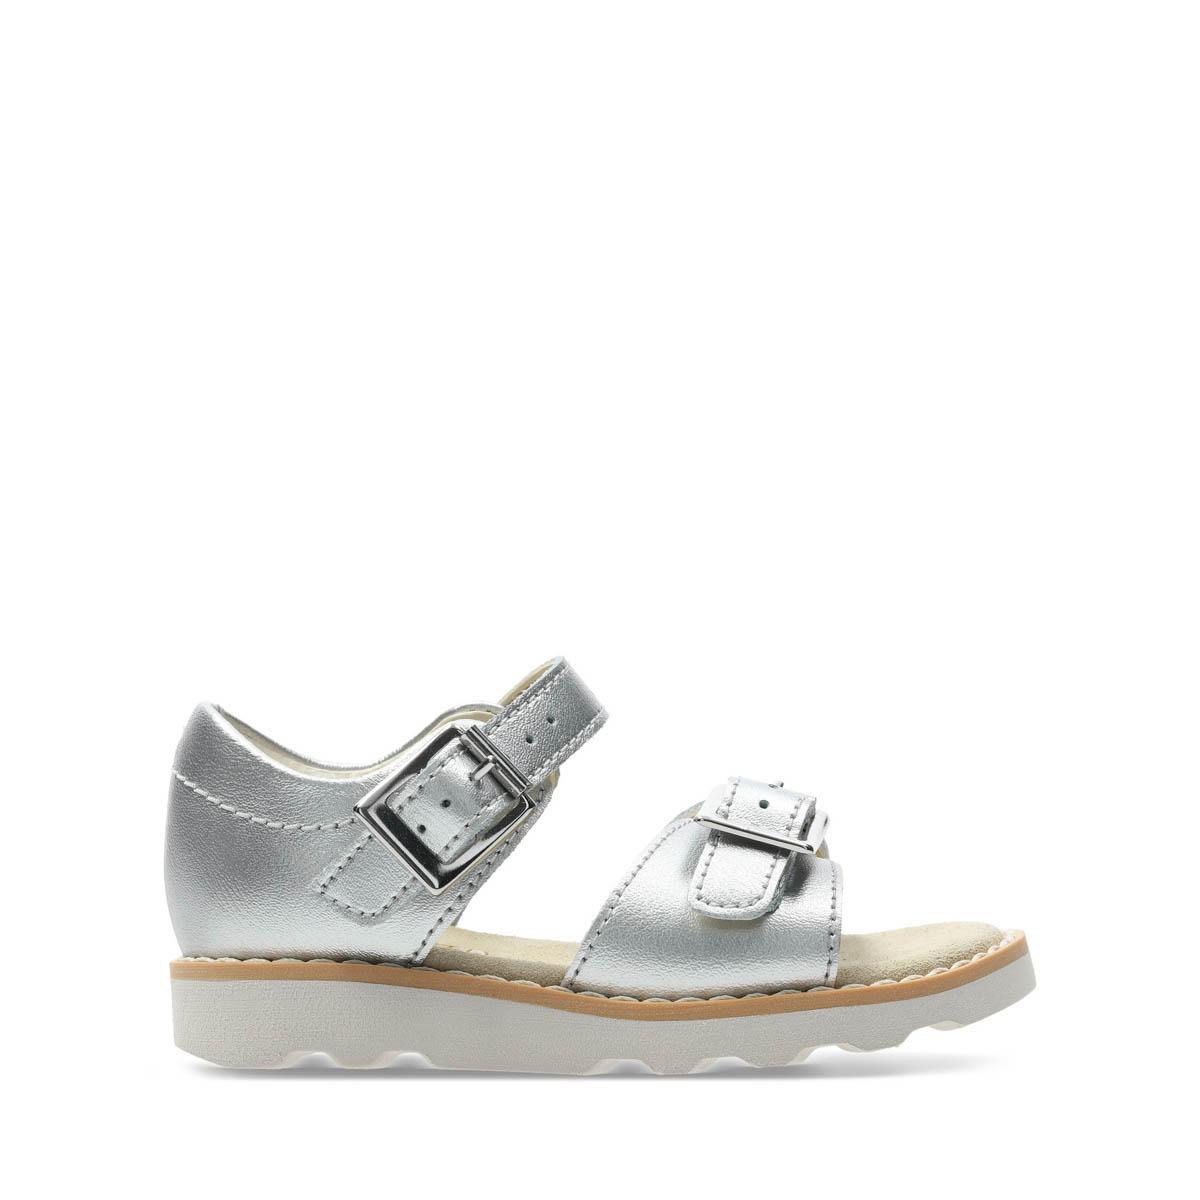 e63e23b525a Clarks Sandals - Silver - 411226F CROWN BLOOM T